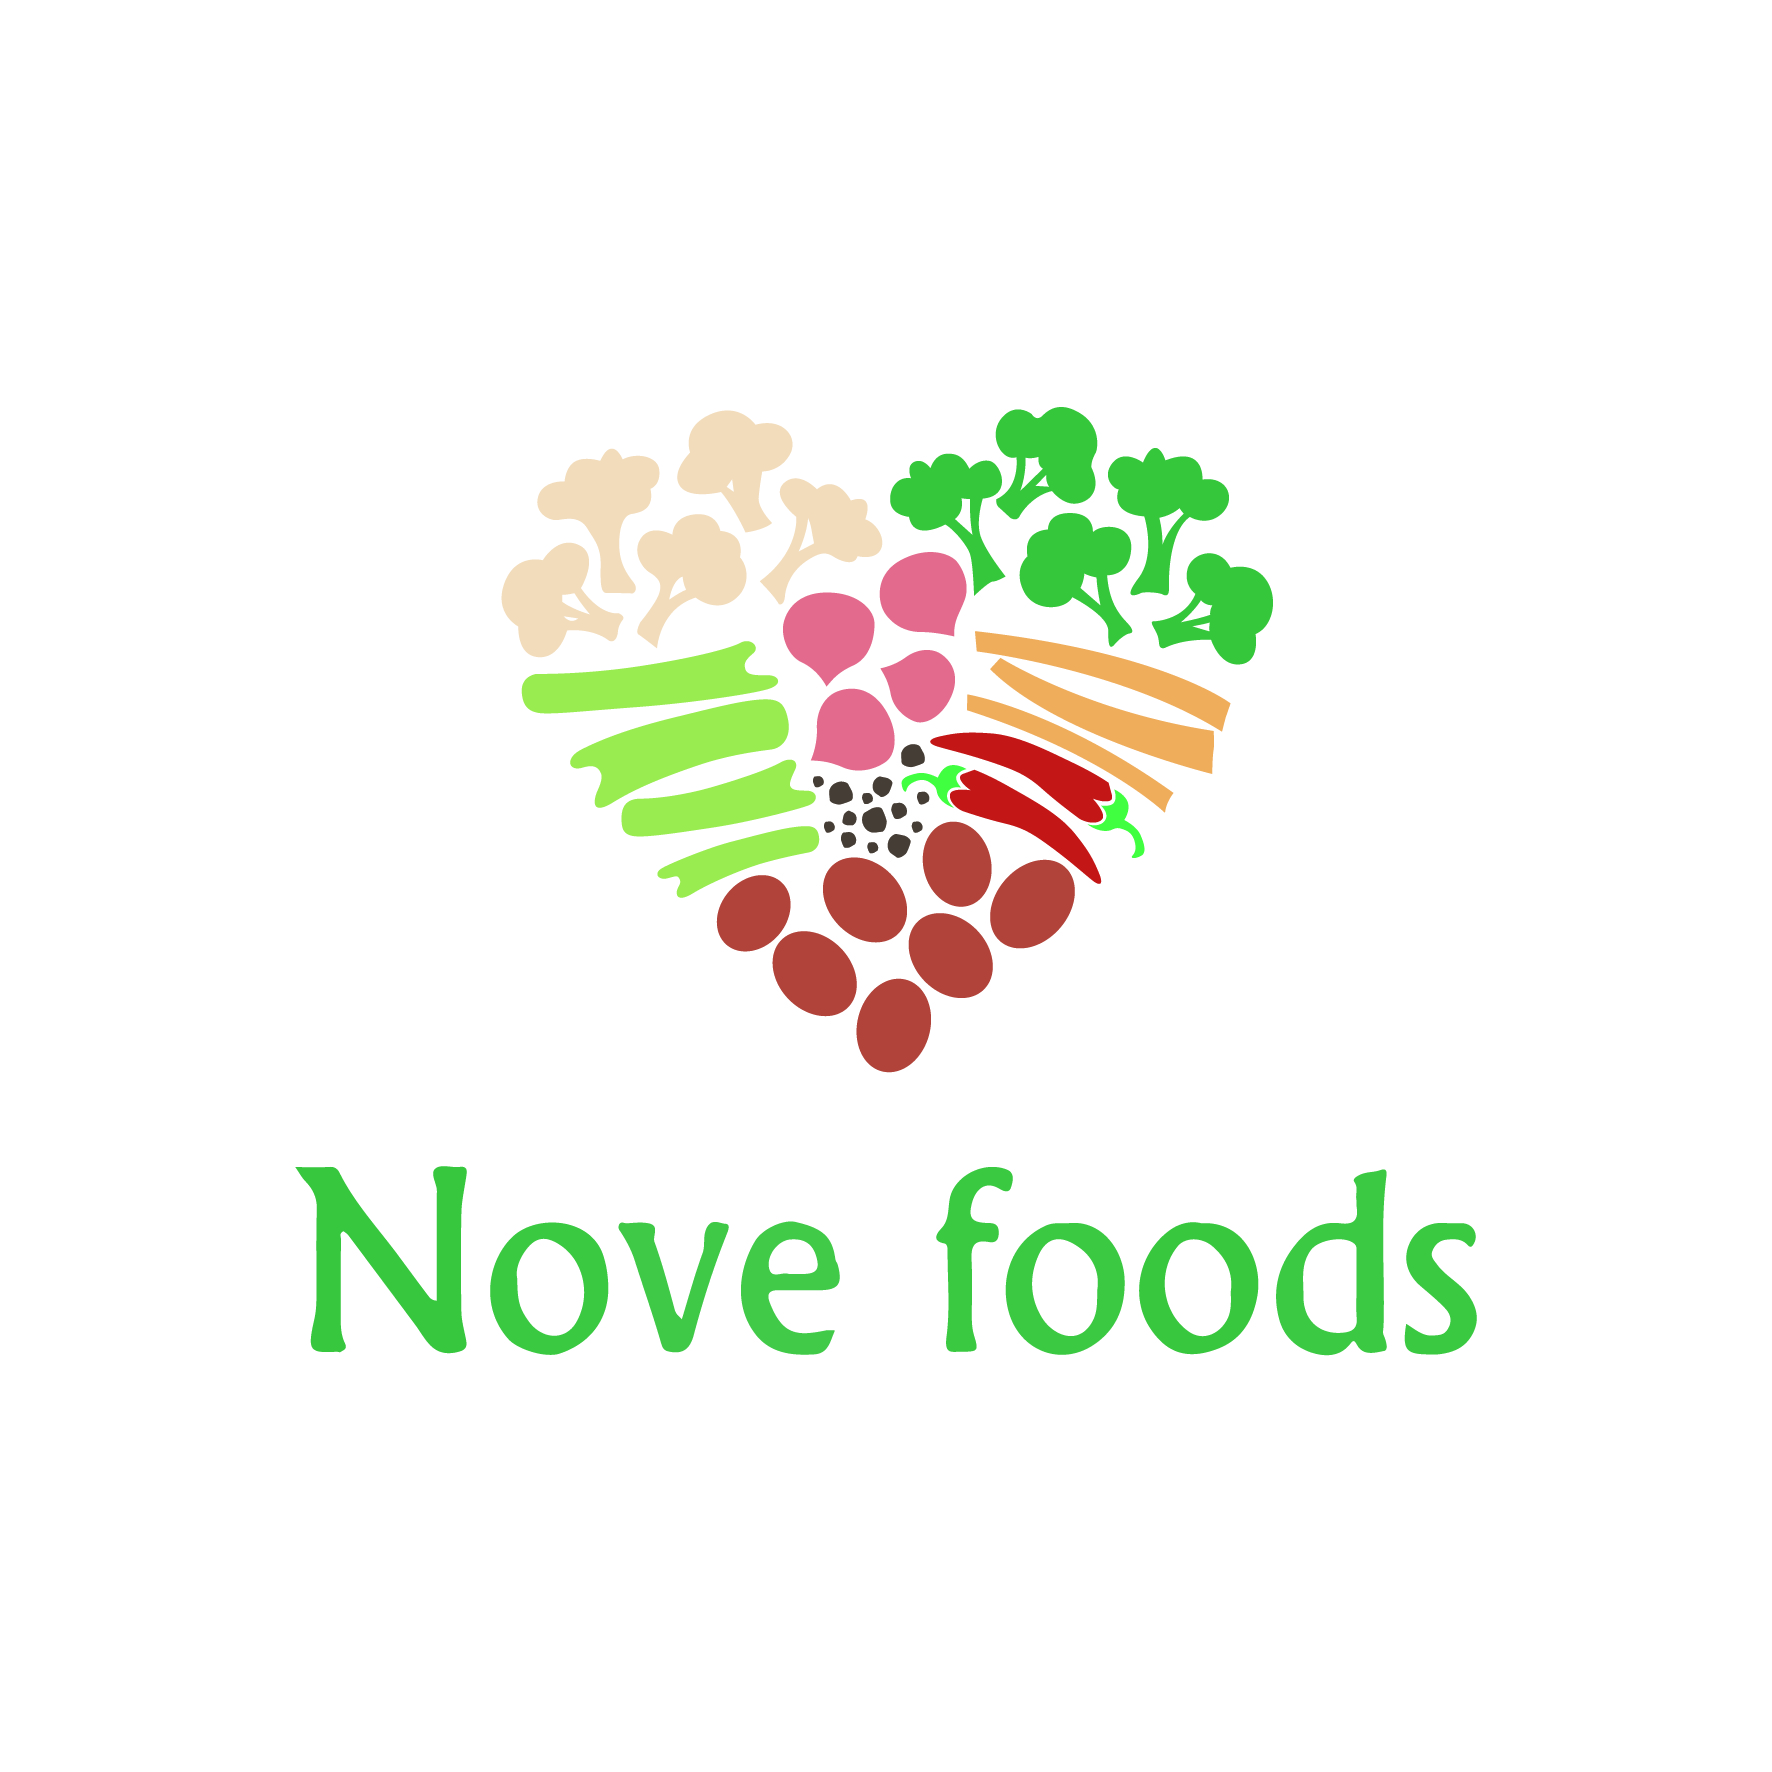 Logo Nove foods.jpg